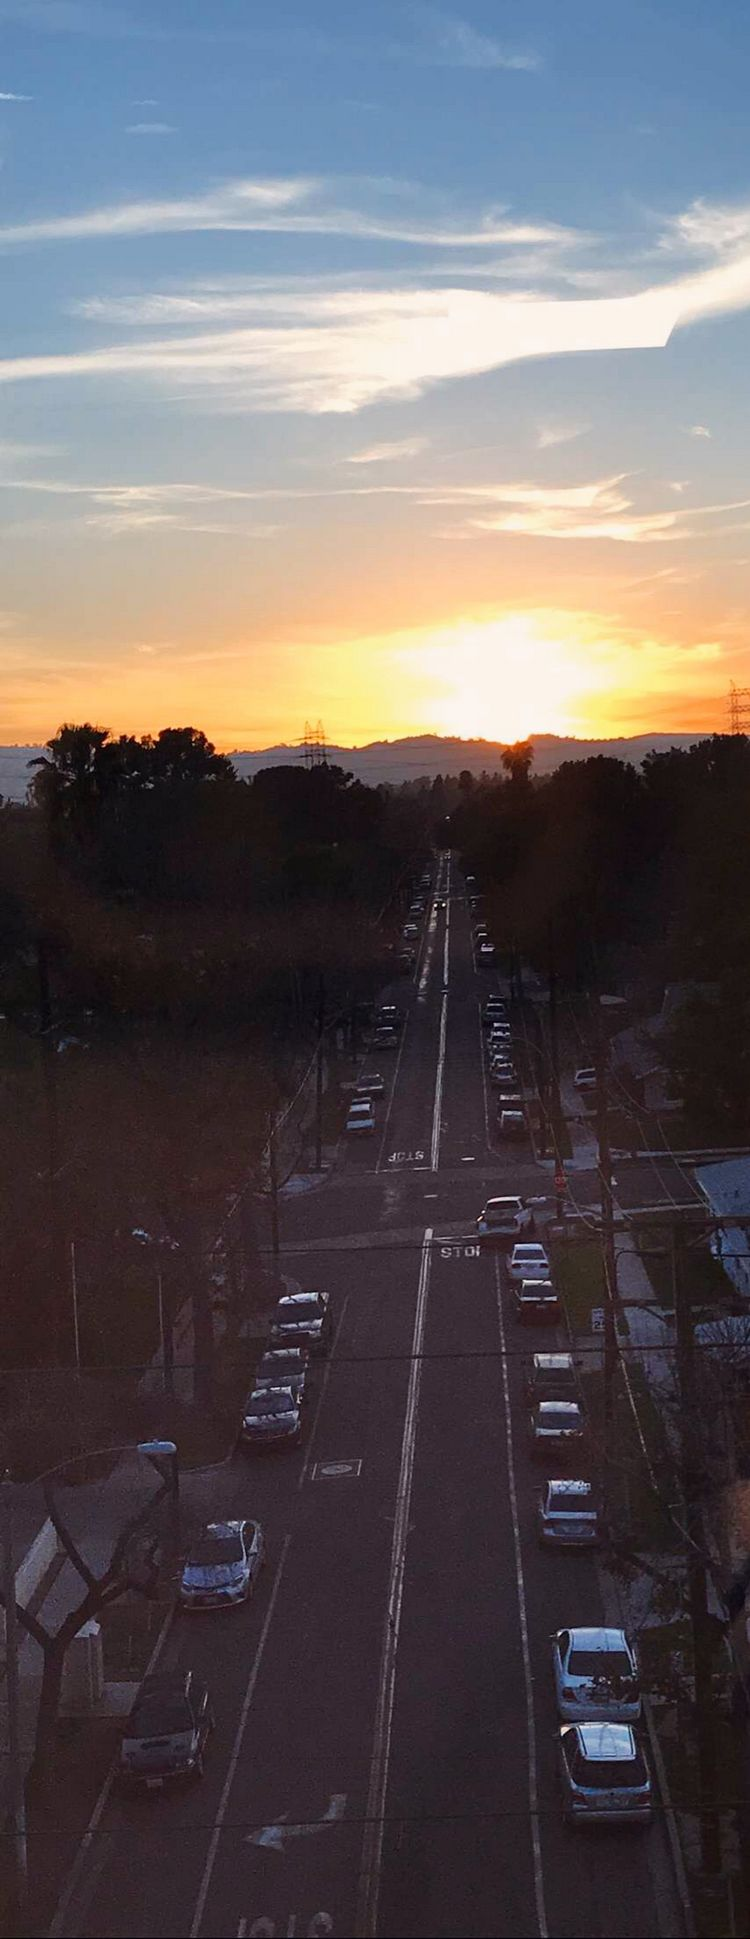 Burbank, California WhereGalsWander